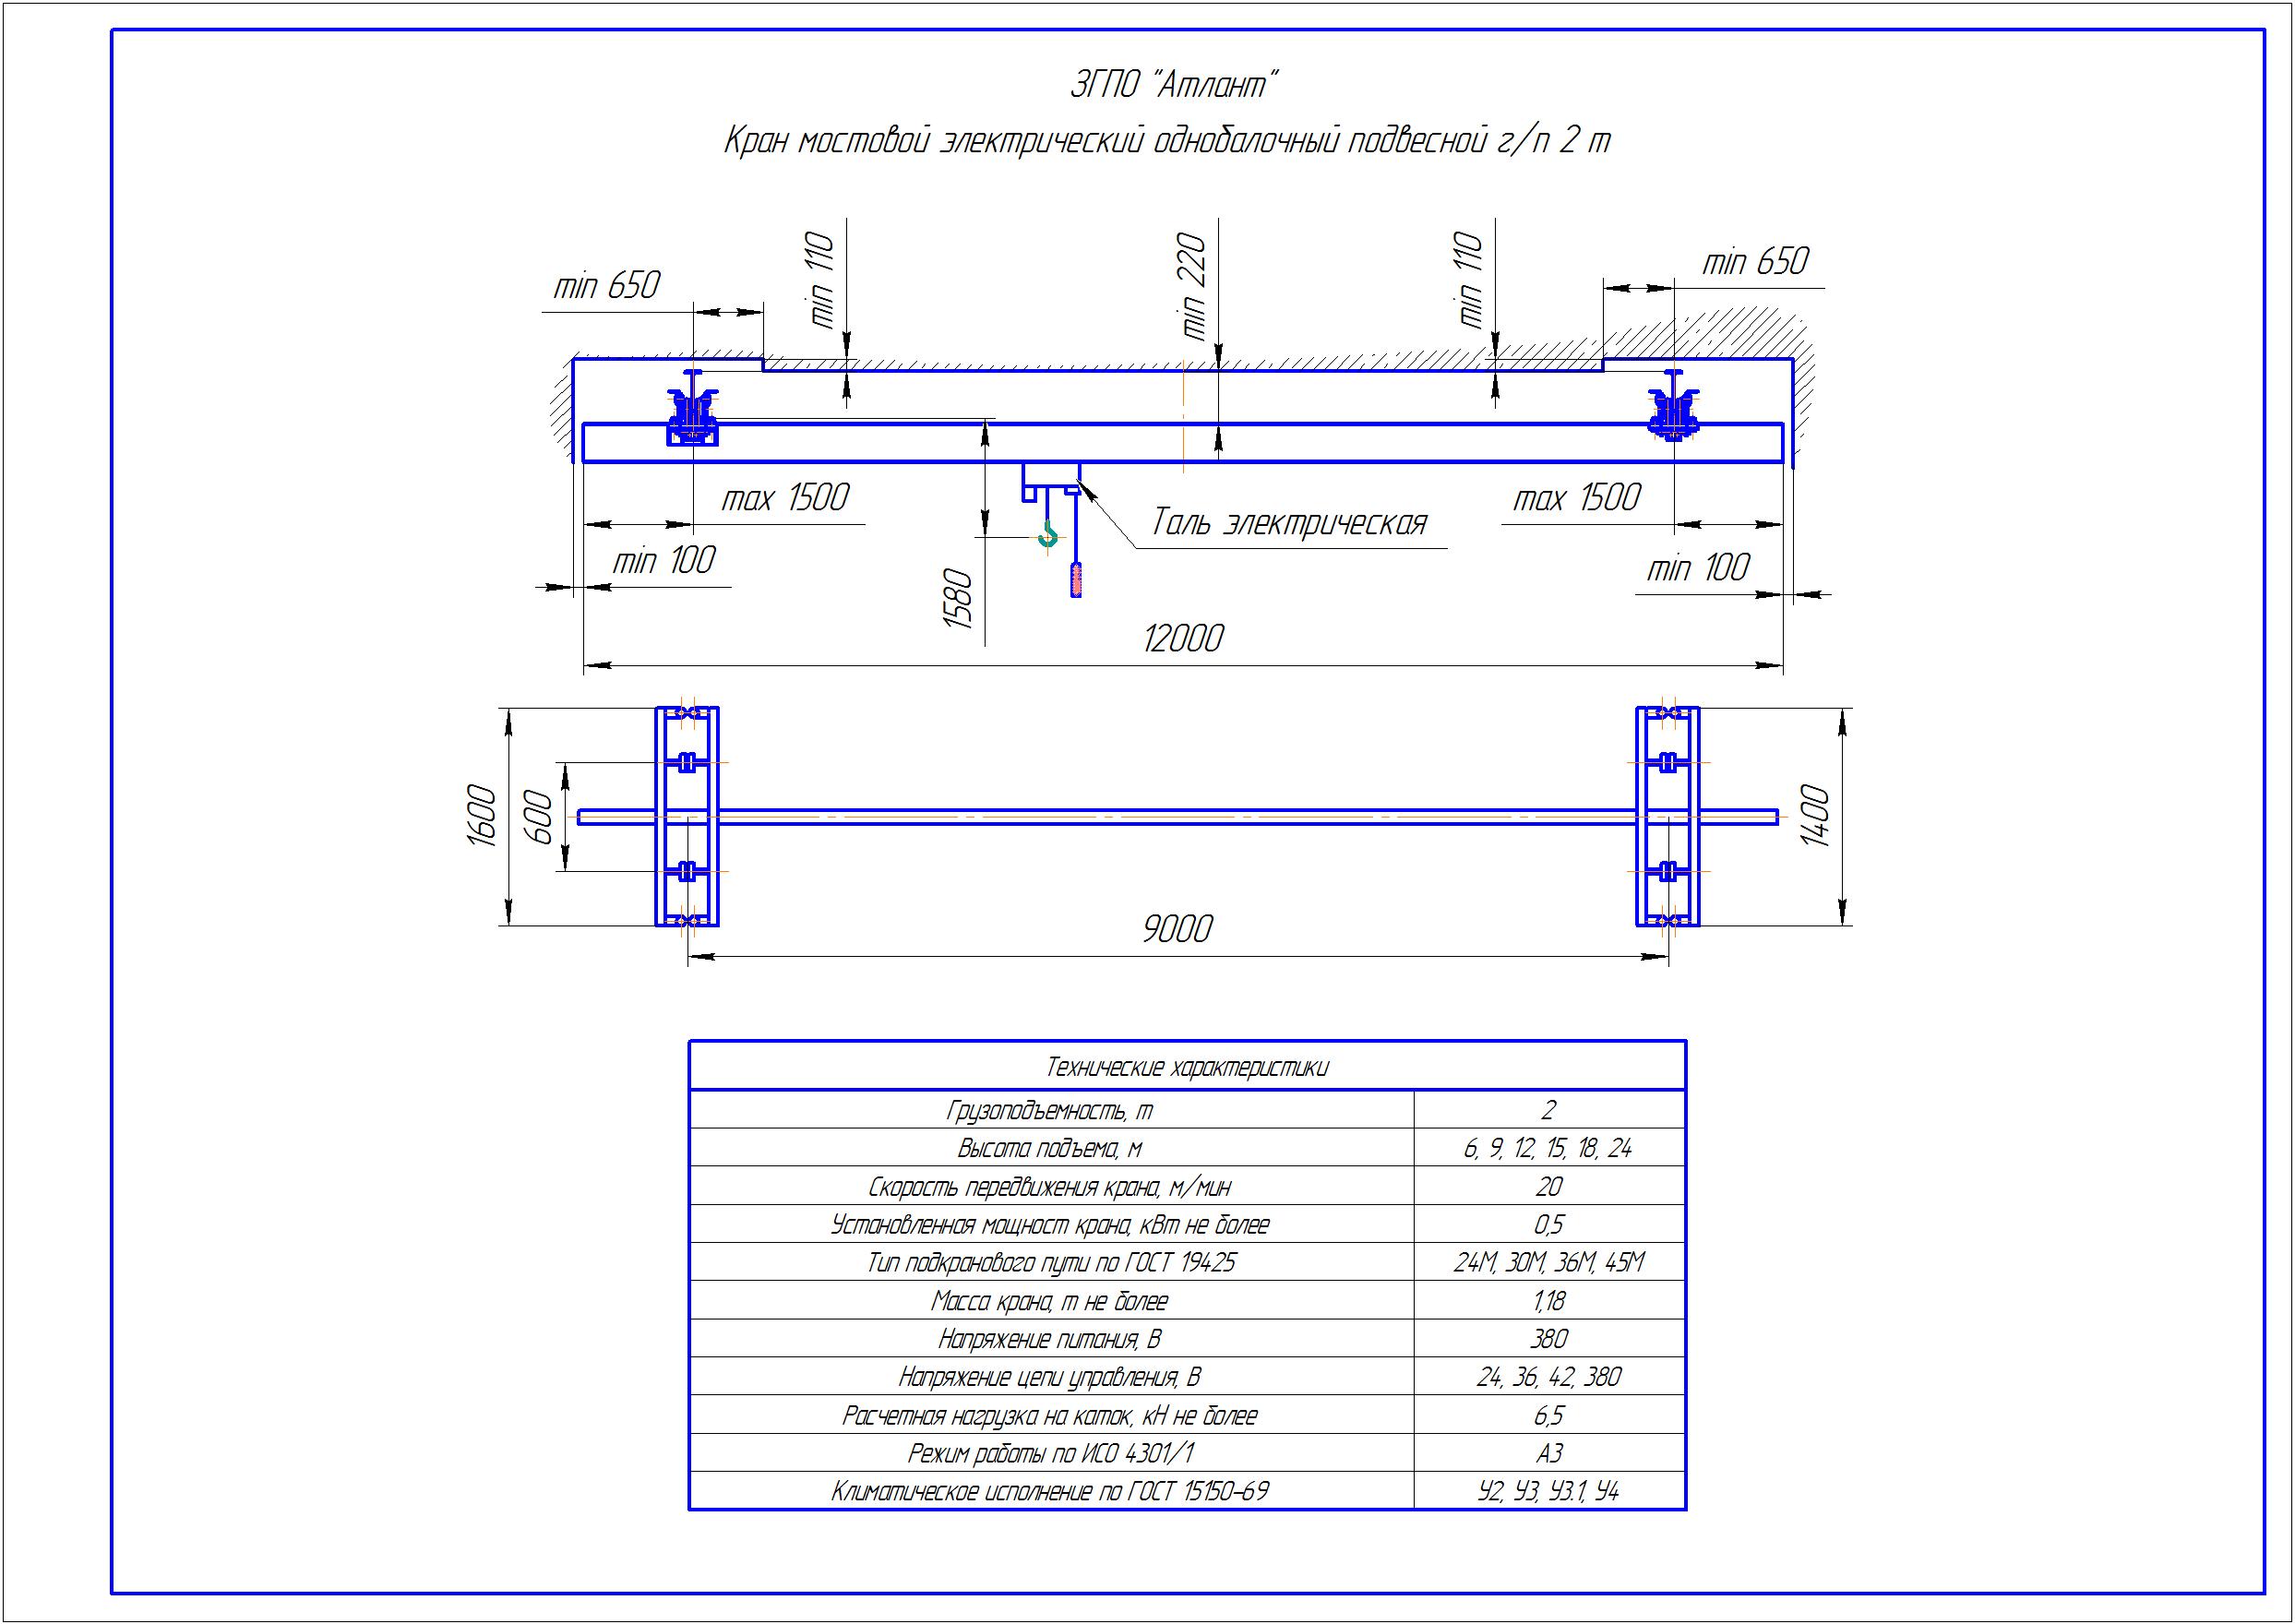 KBP 2 3 - Подвесная кран балка